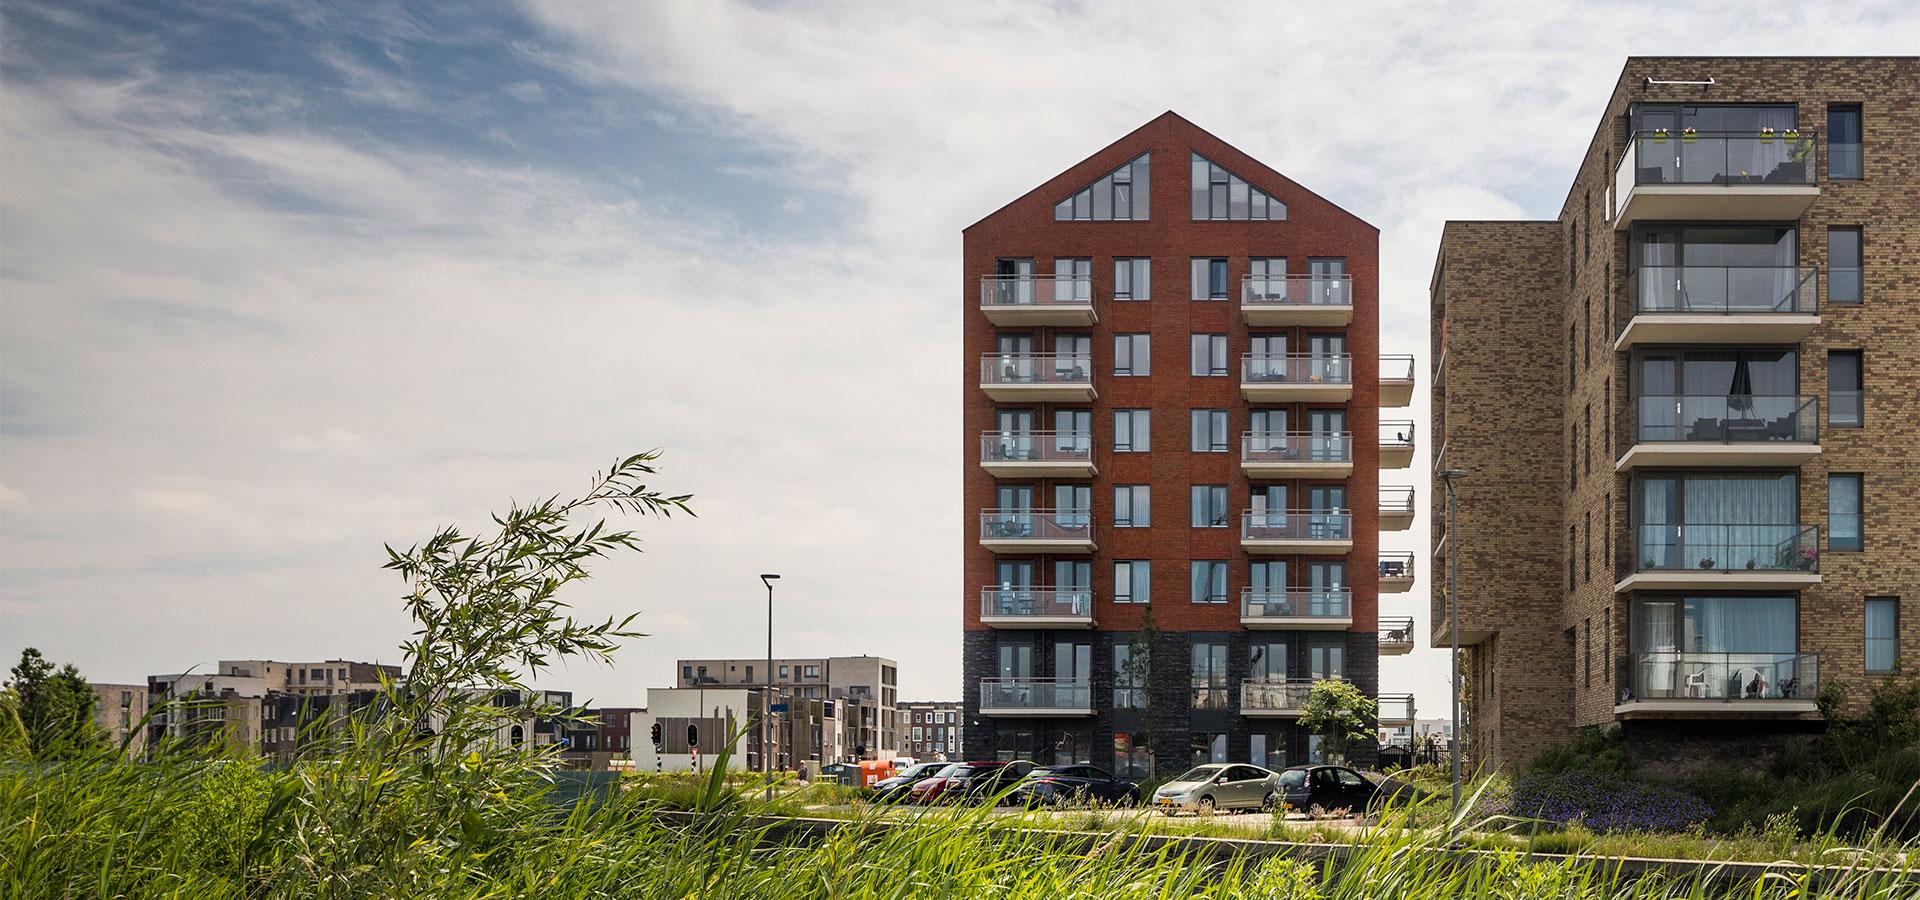 FARO architecten Oranjehuis Almere 01